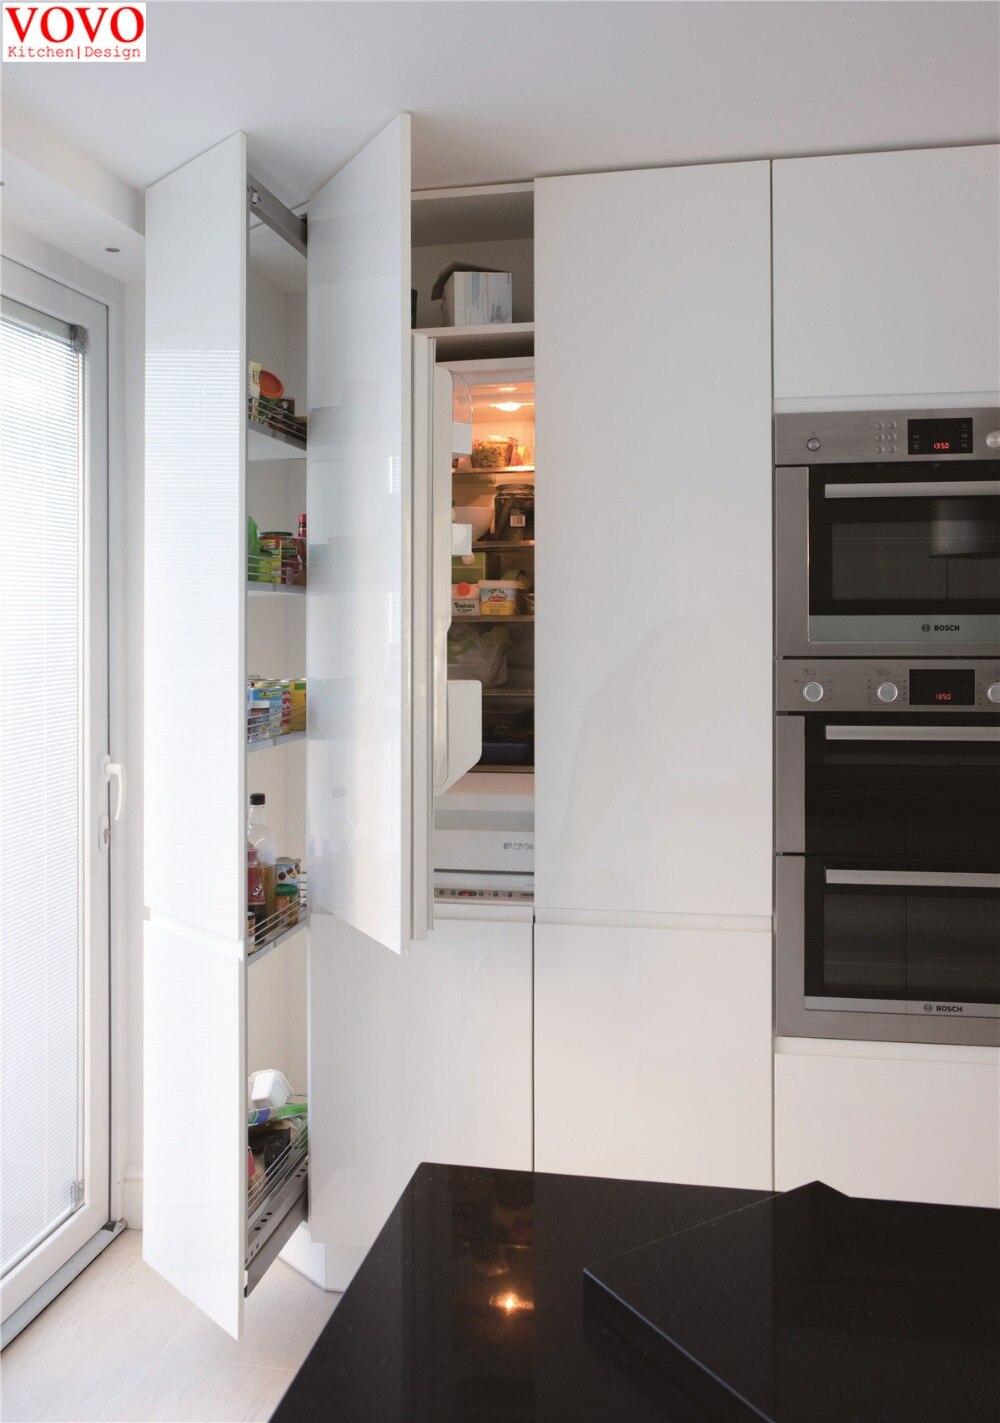 Dispensa cucina vintagedispensa per cucina : dispensa x cucina ...